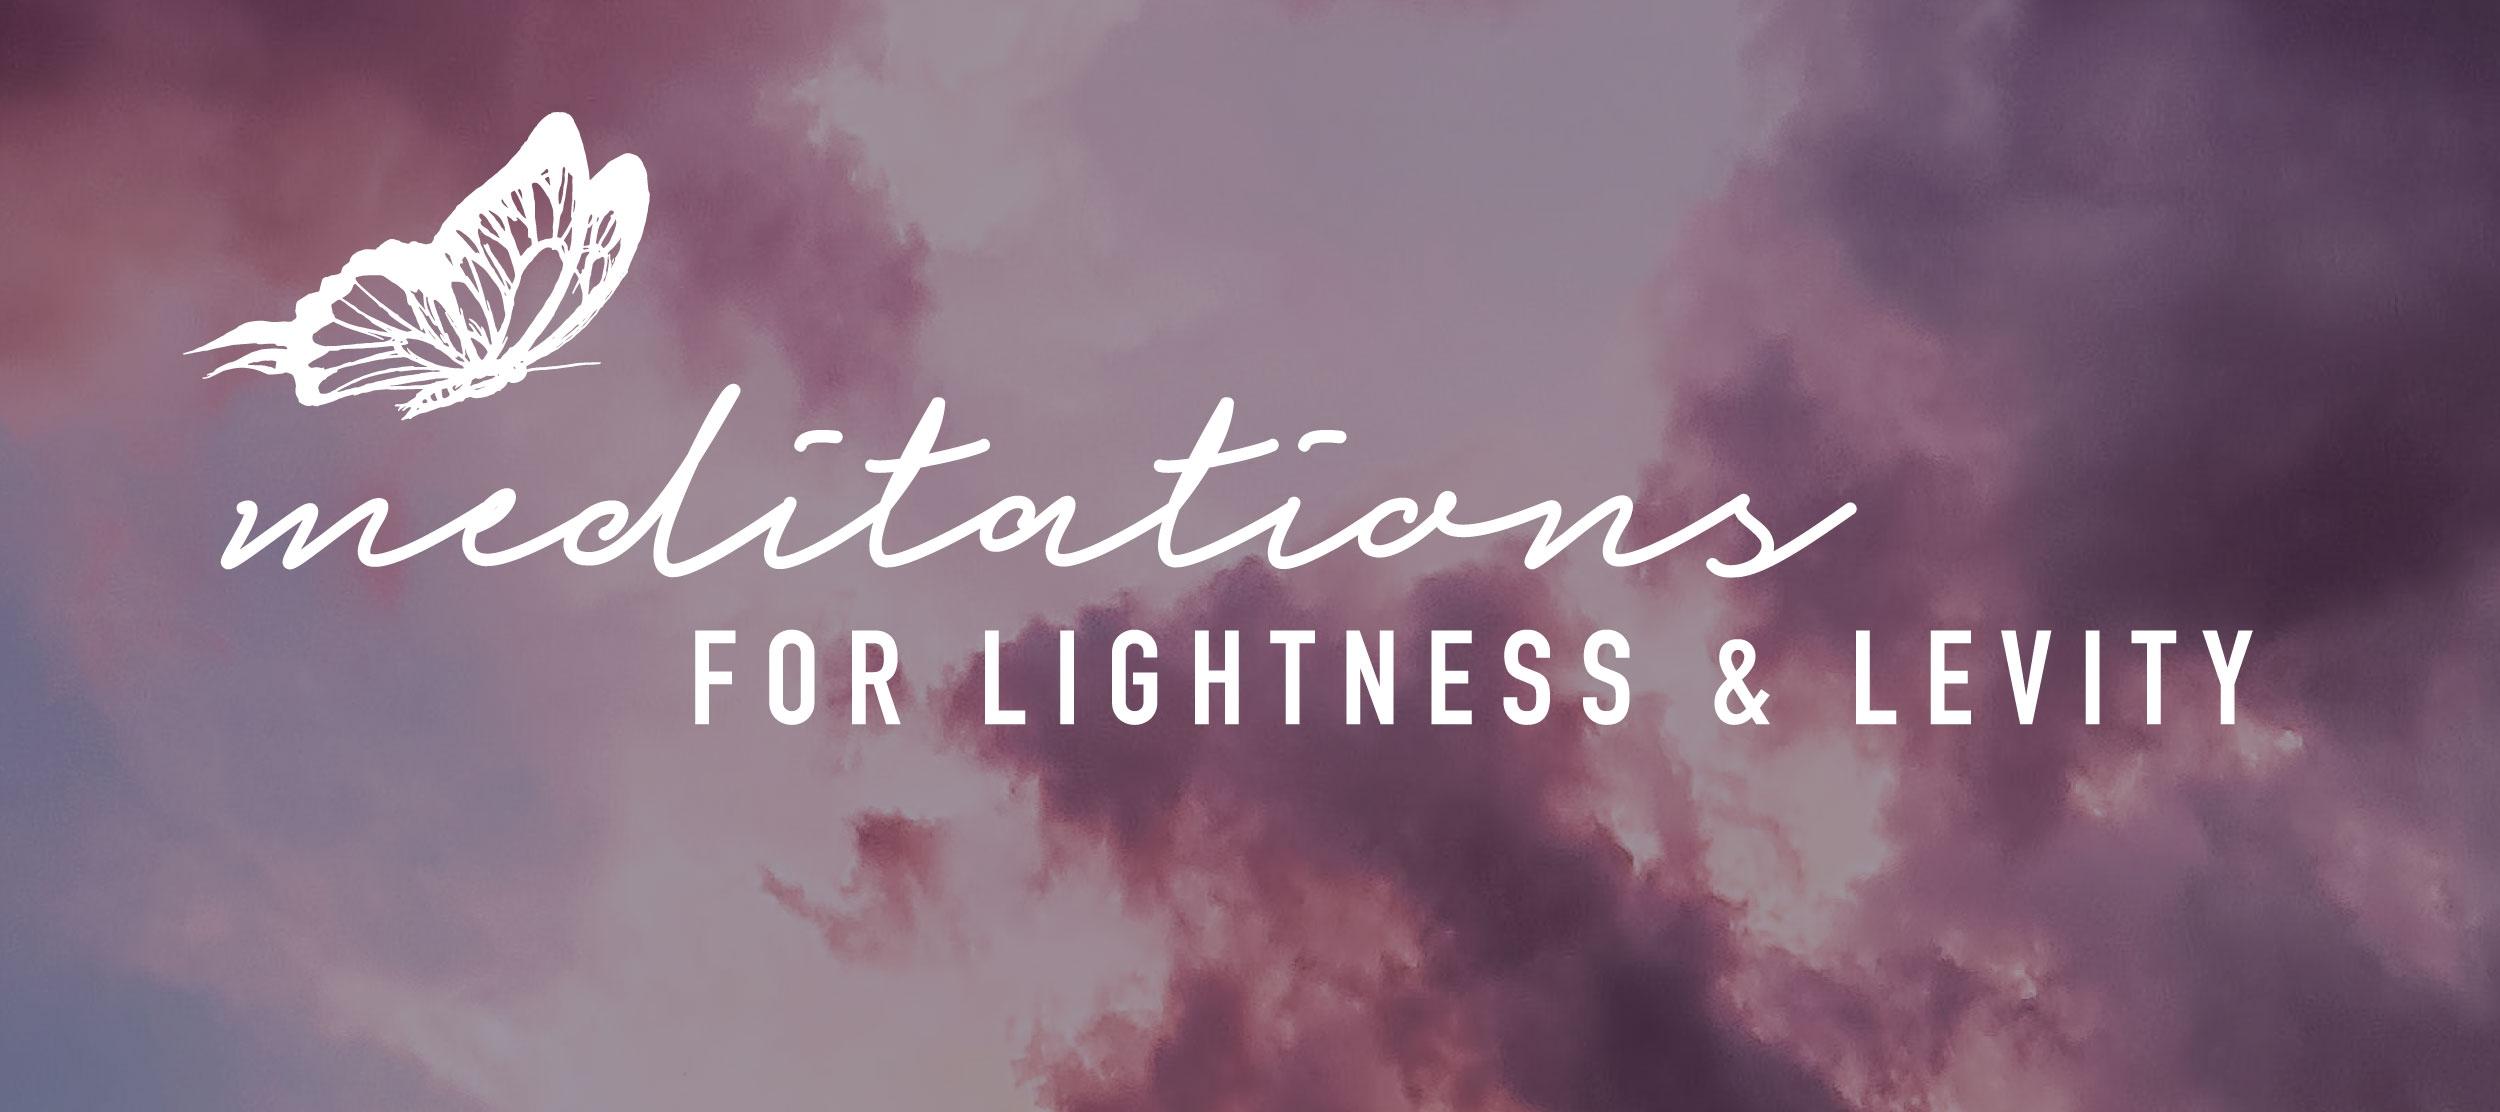 meditations-for-lightness-and-levity.jpg